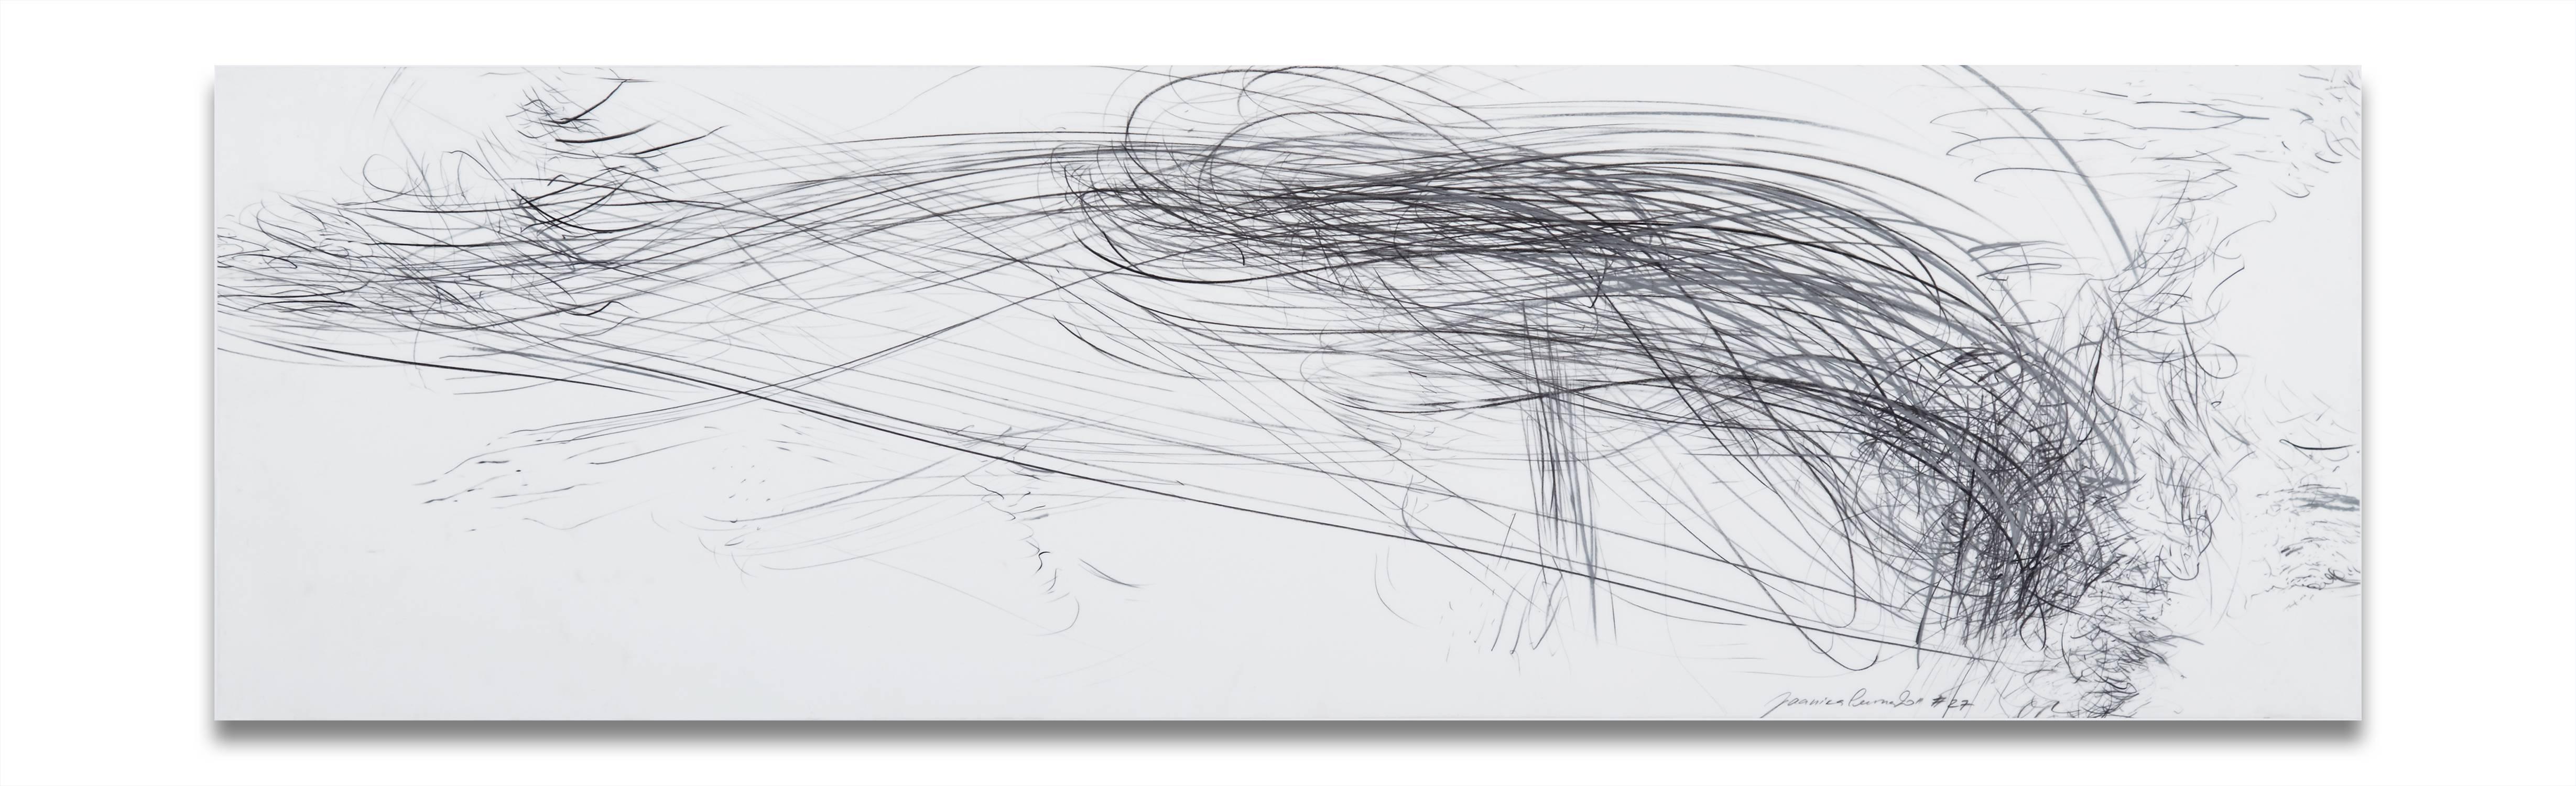 Storm series horizontal 40 (Abstract drawing)